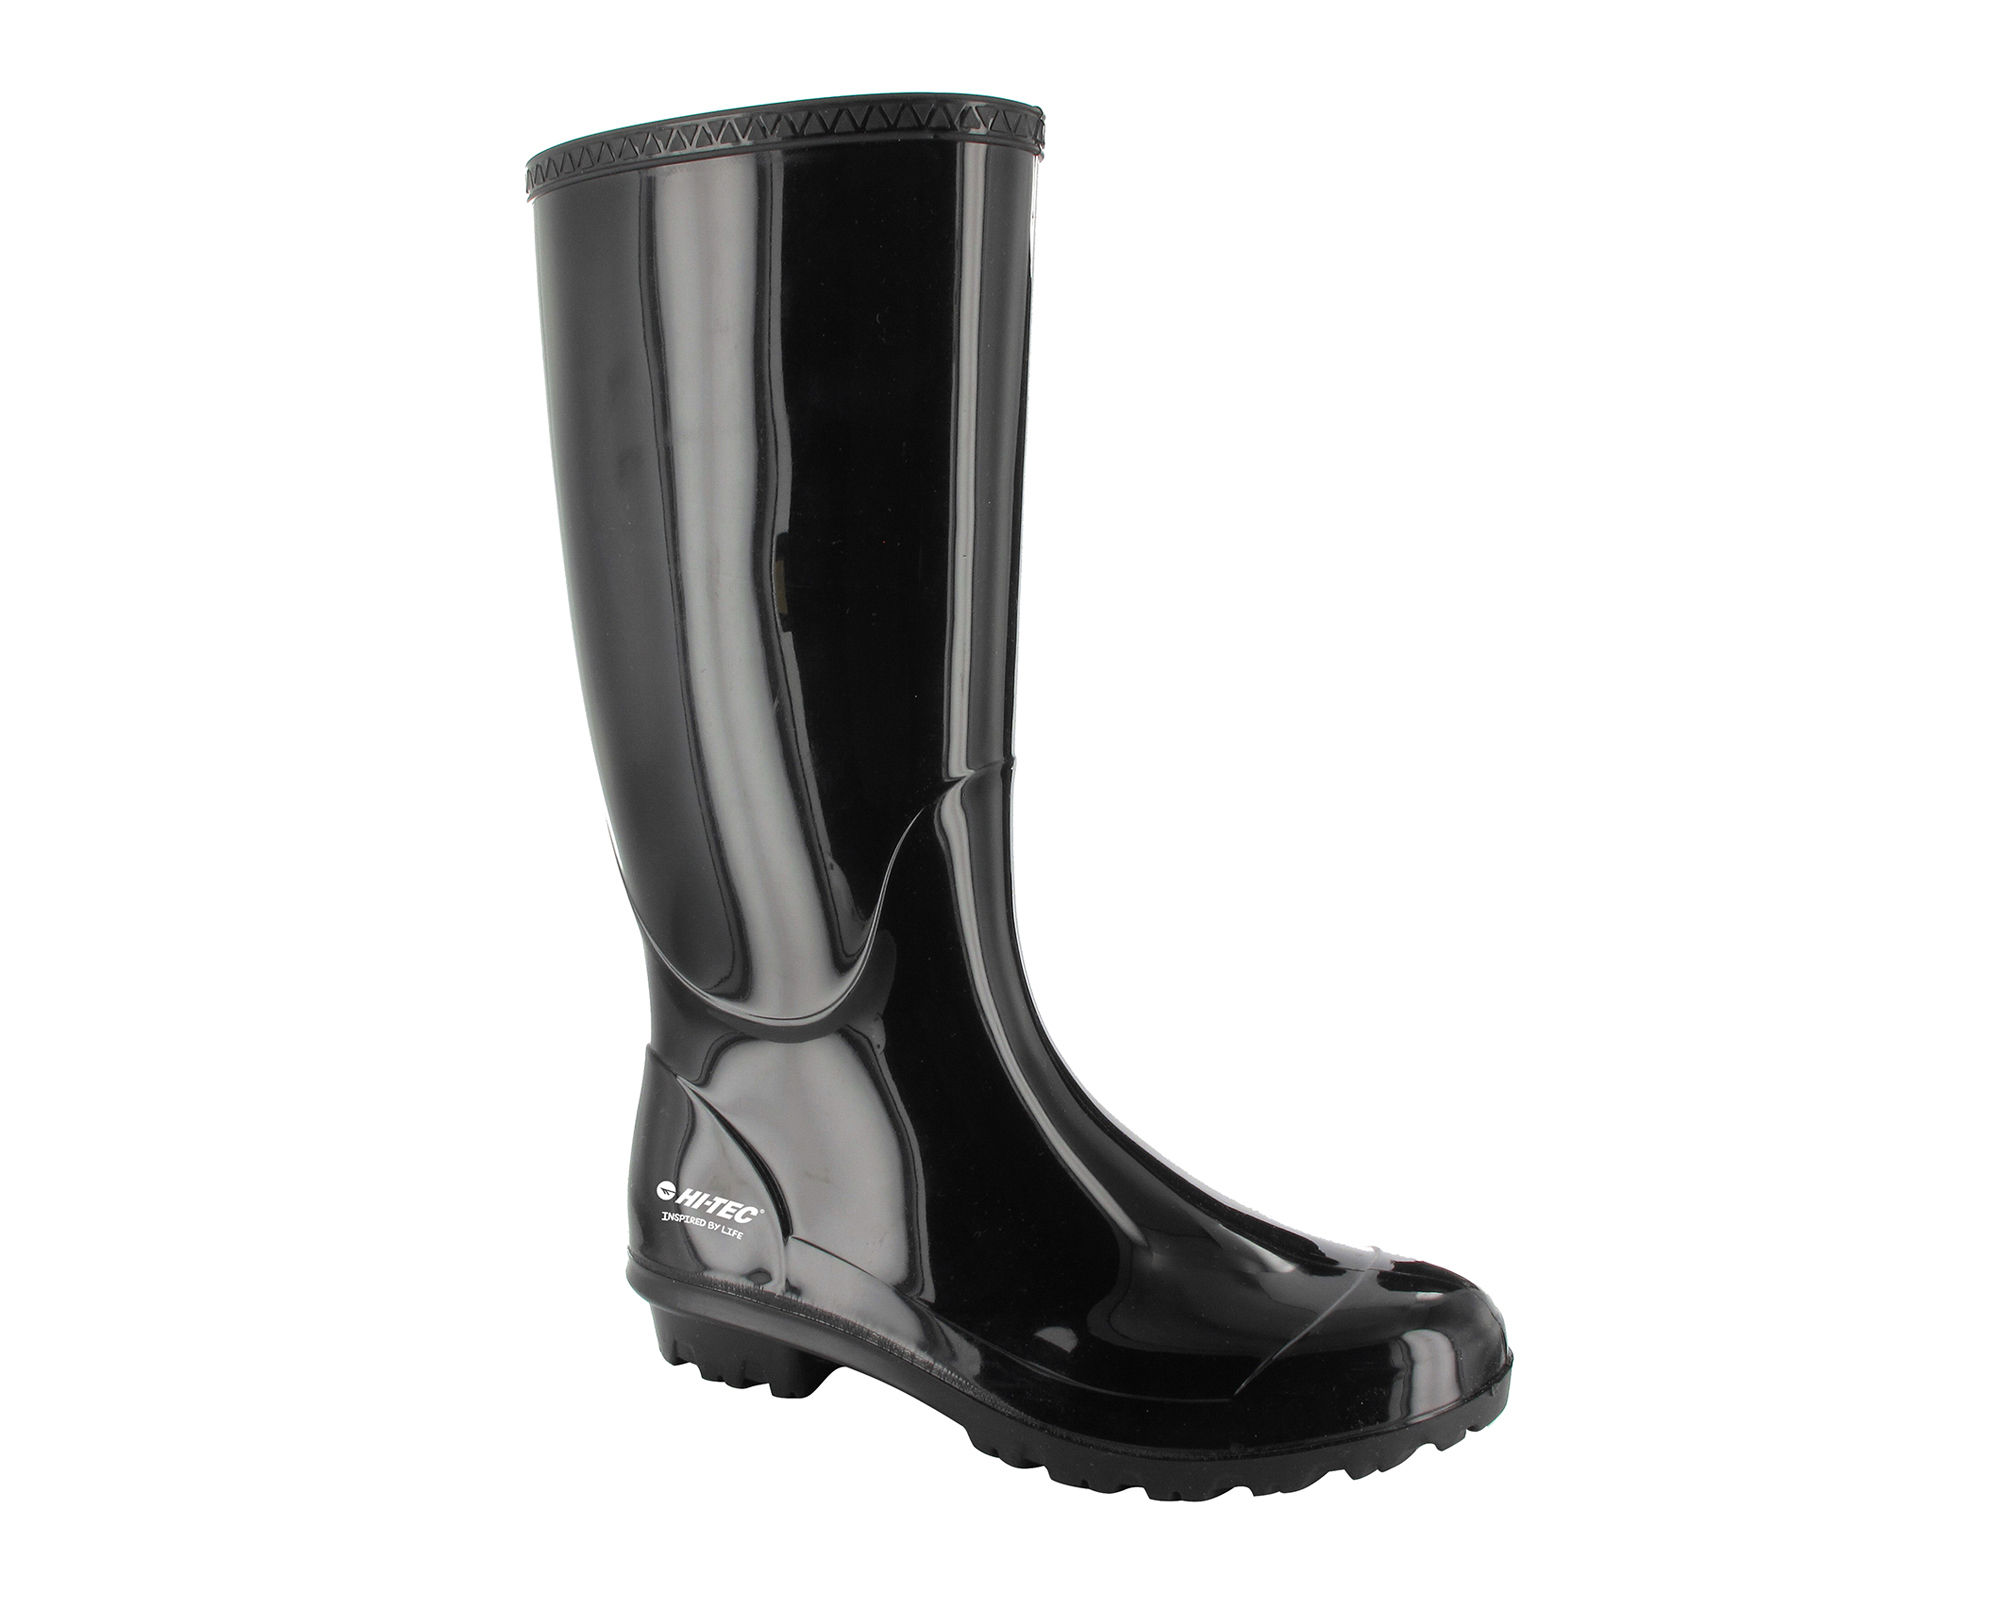 Innovative Rain Amp Rubber Boots  Boots For Men Amp Women  Academy